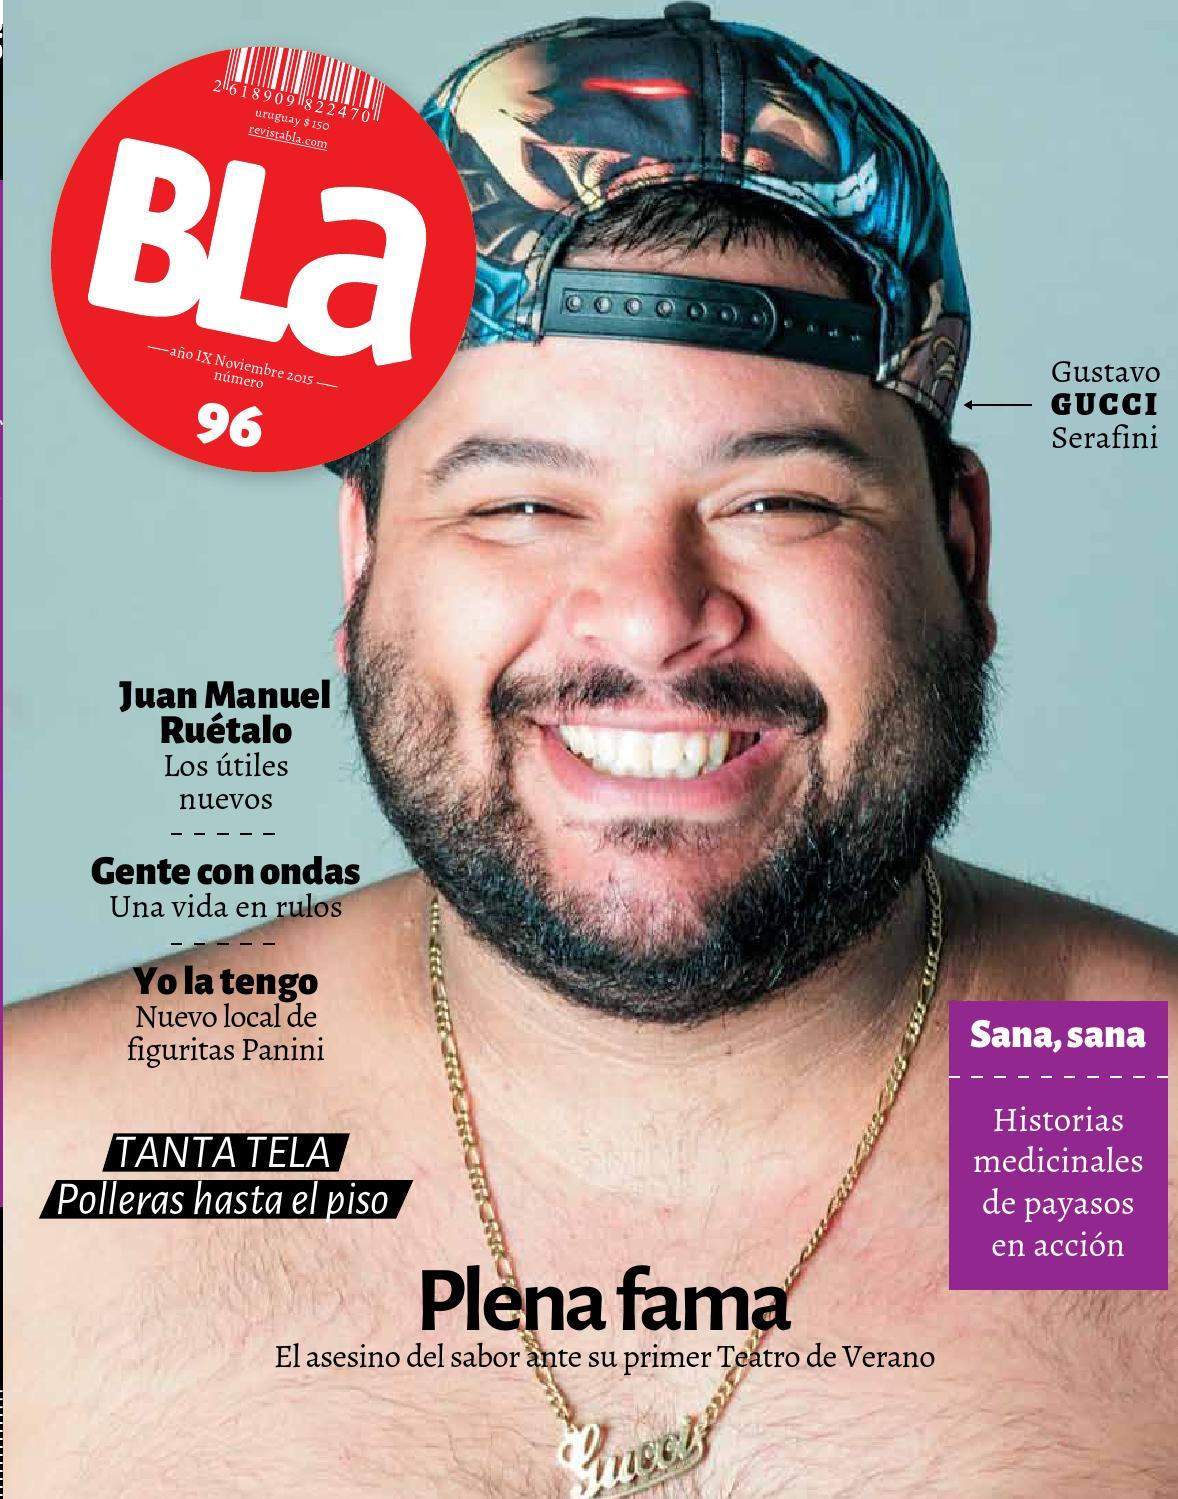 a255d736a387 BLa 96 noviembre by Editorial BLa - issuu